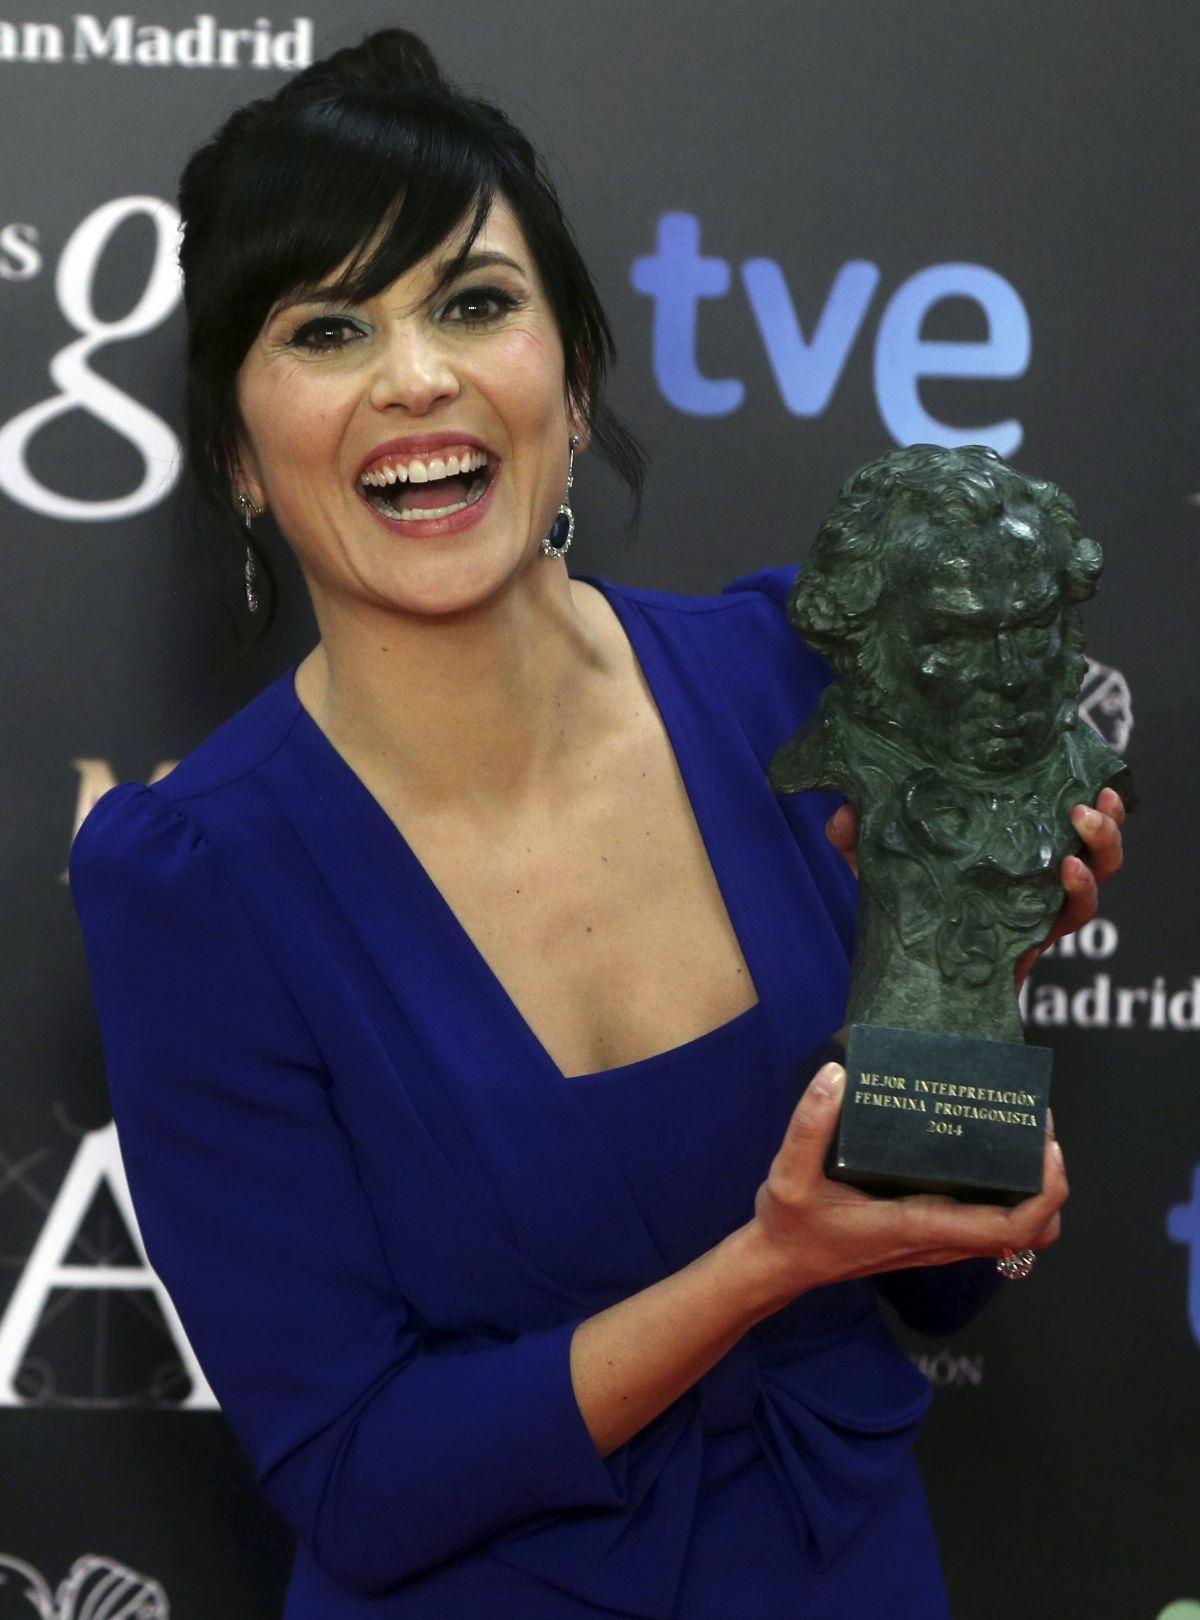 MARIAN ALVAREZ at 2014 Goya Film Awards in Los Angeles